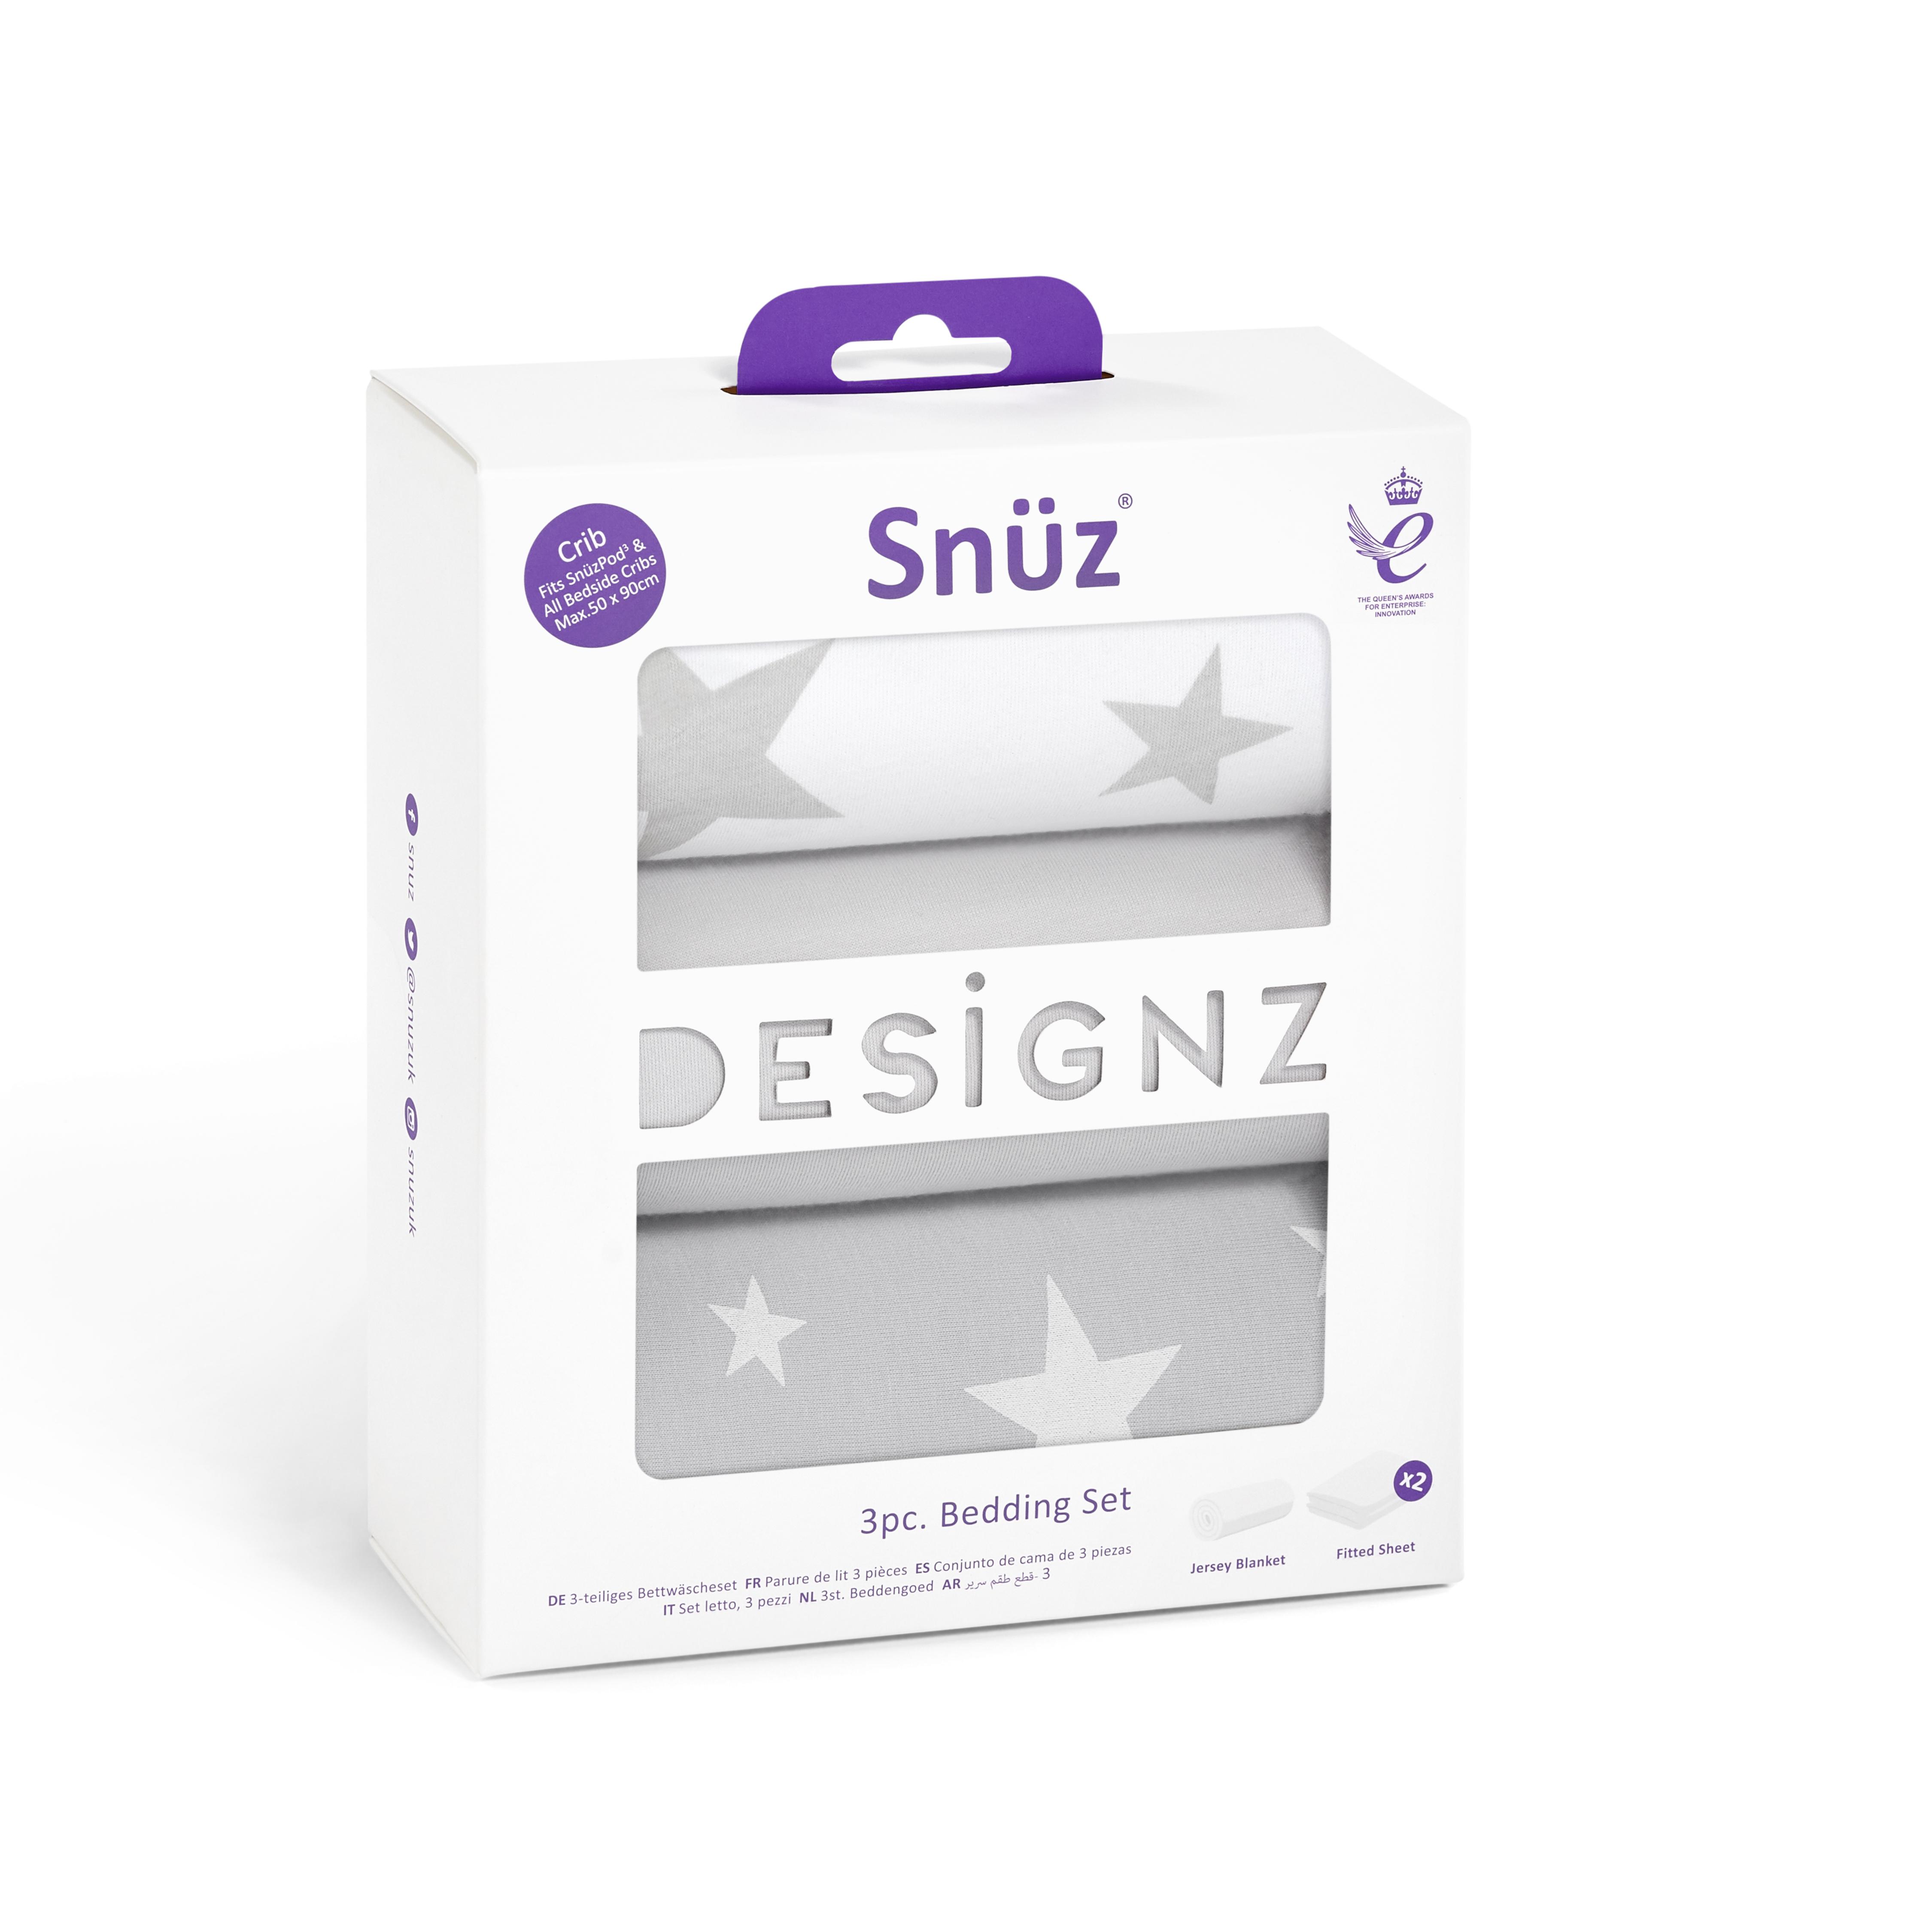 Snuz 3pc. Bedside Crib Bedding Set - Stars